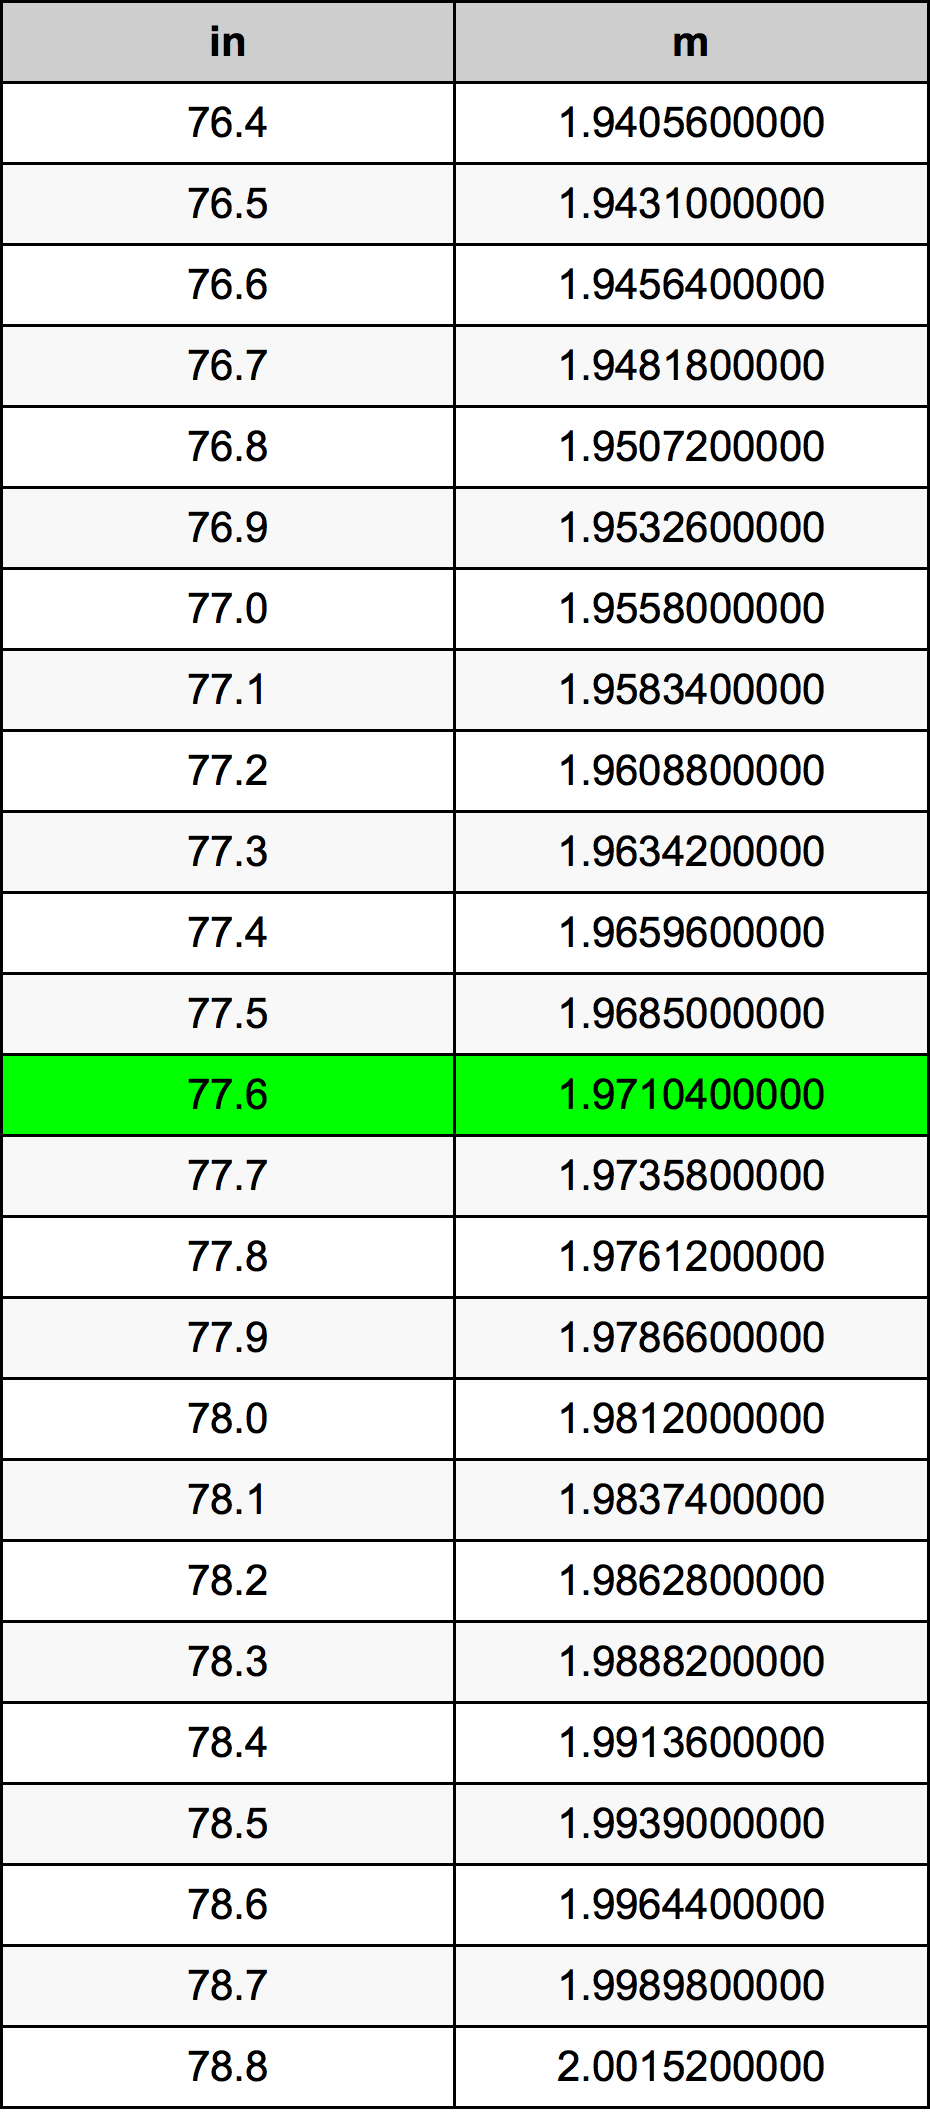 77.6 дюйм Таблица преобразования